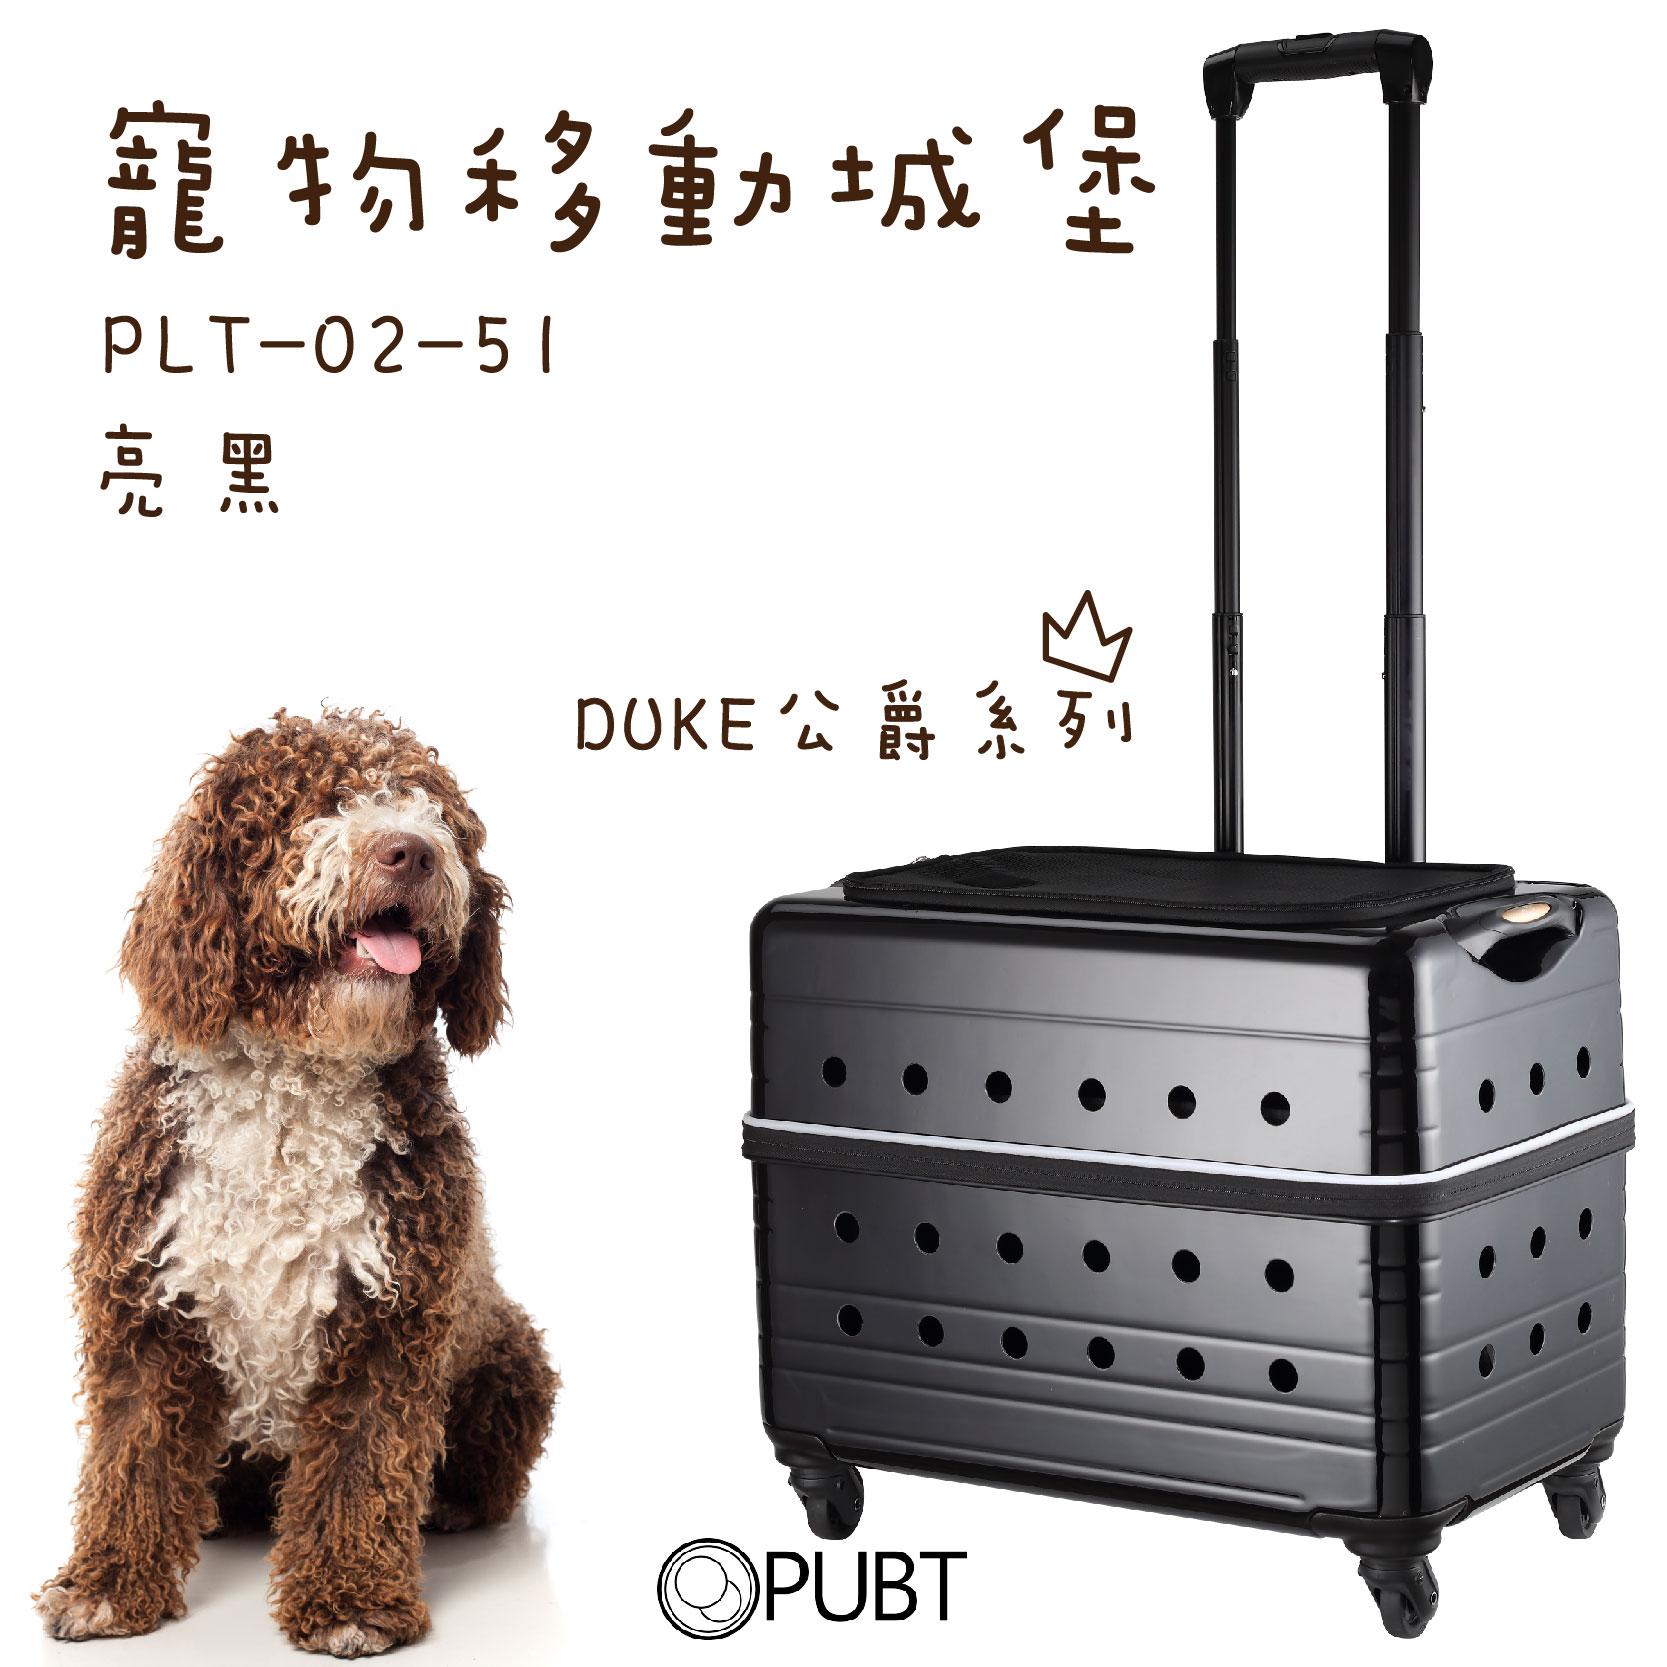 DUKE公爵系列│PUBT PLT-02-51 寵物推車 亮黑 寵物外出包 寵物拉桿包 寵物 適用12kg以下犬貓